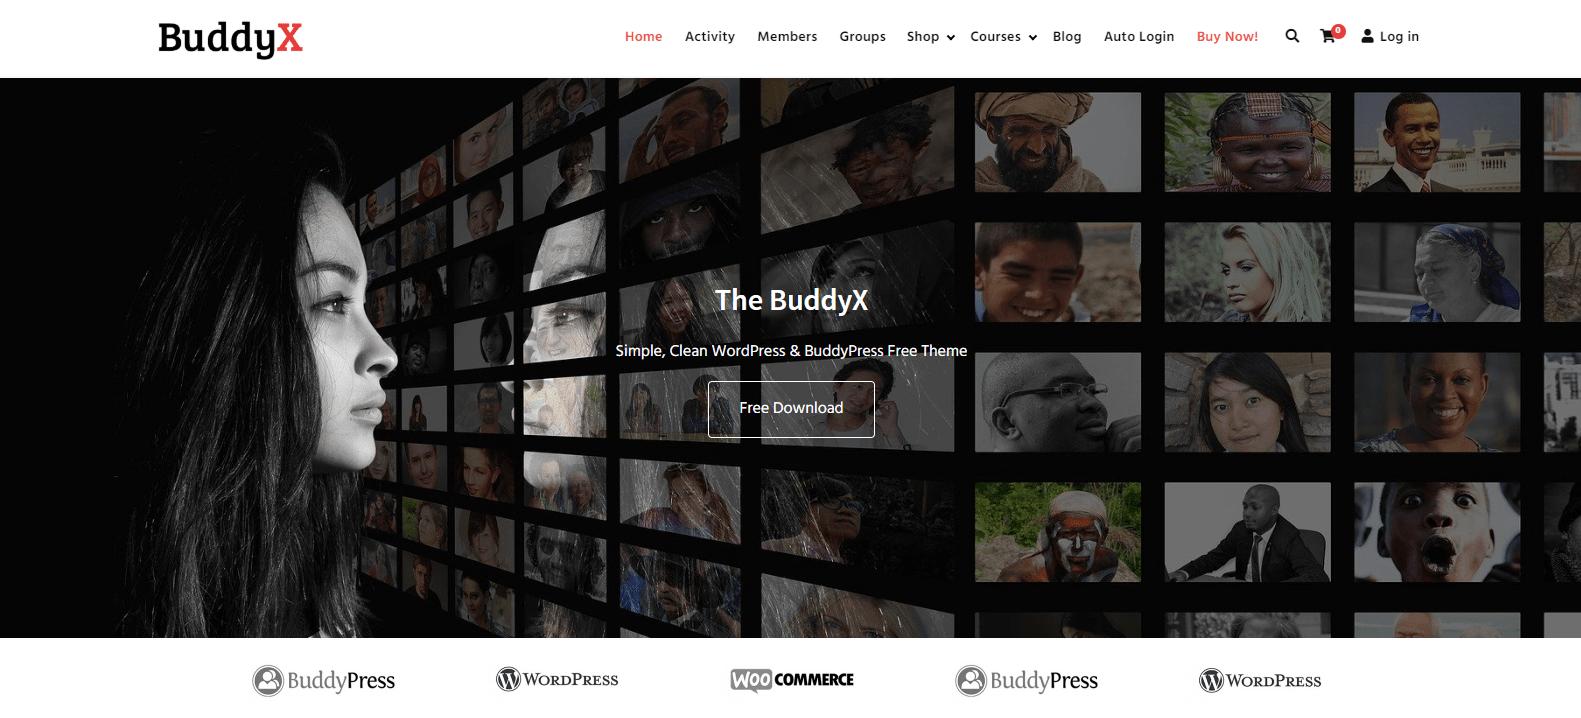 buddyx-theme